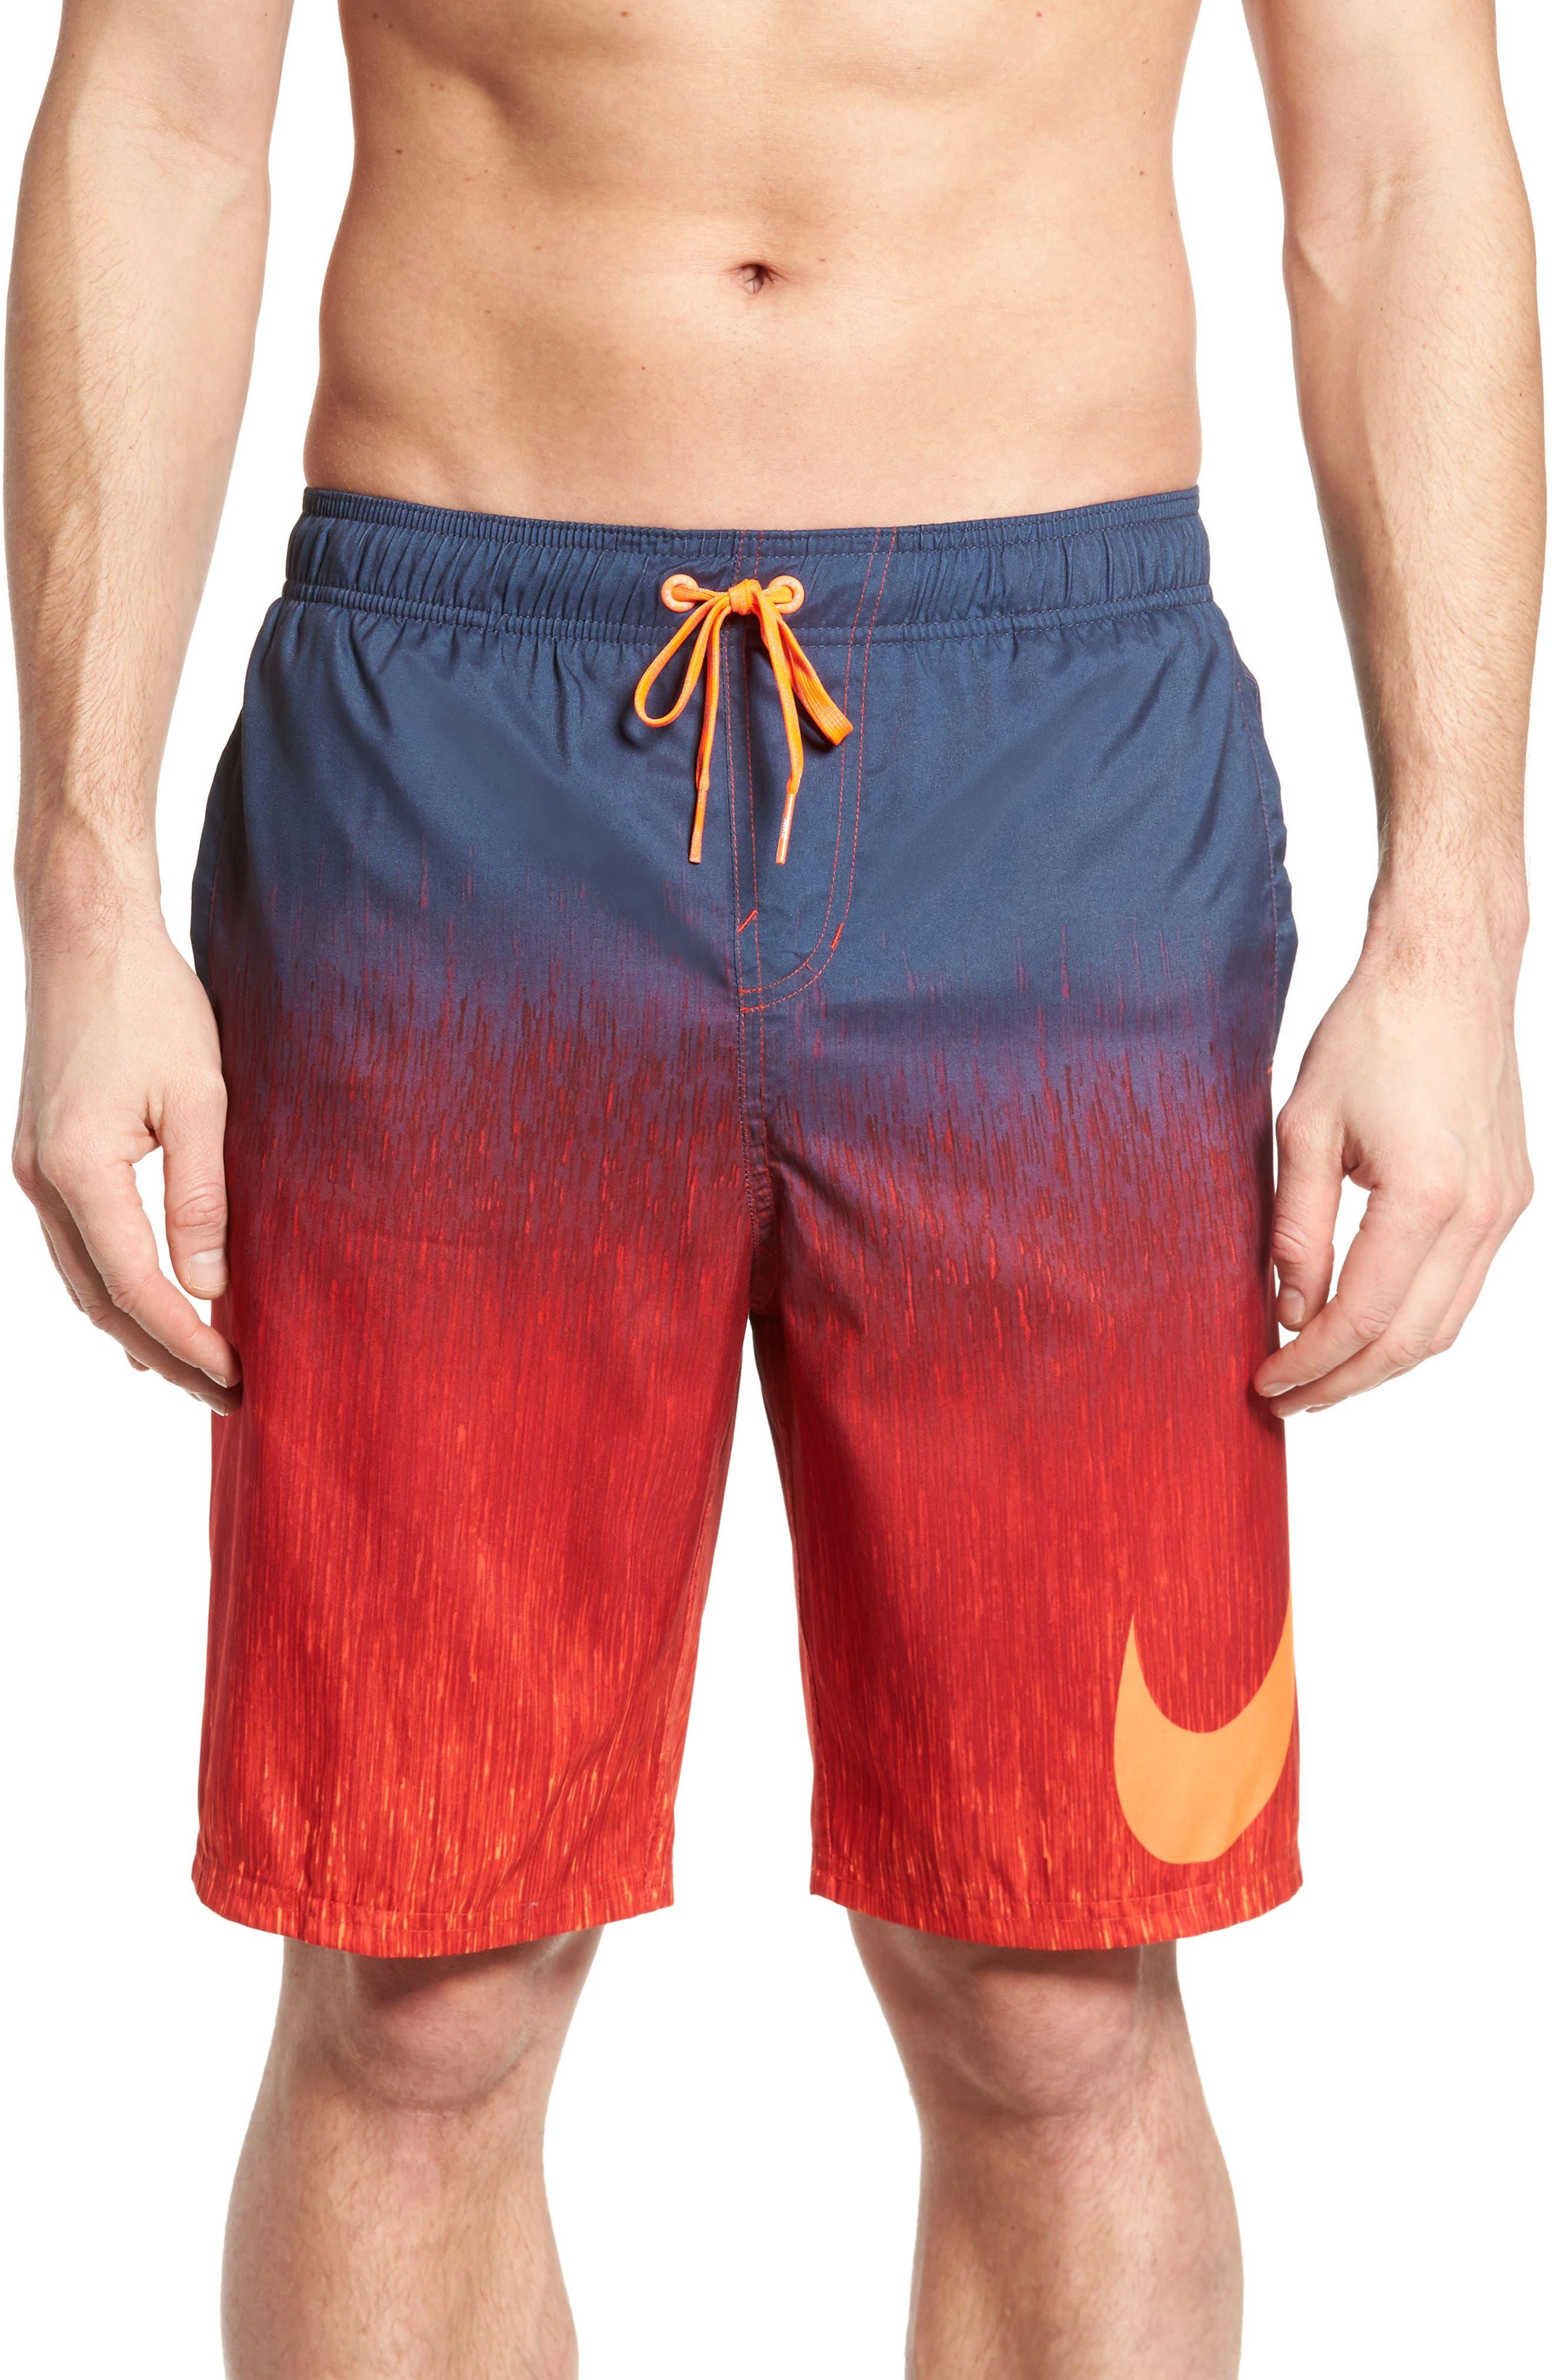 Nike Breaker Swim Trunks